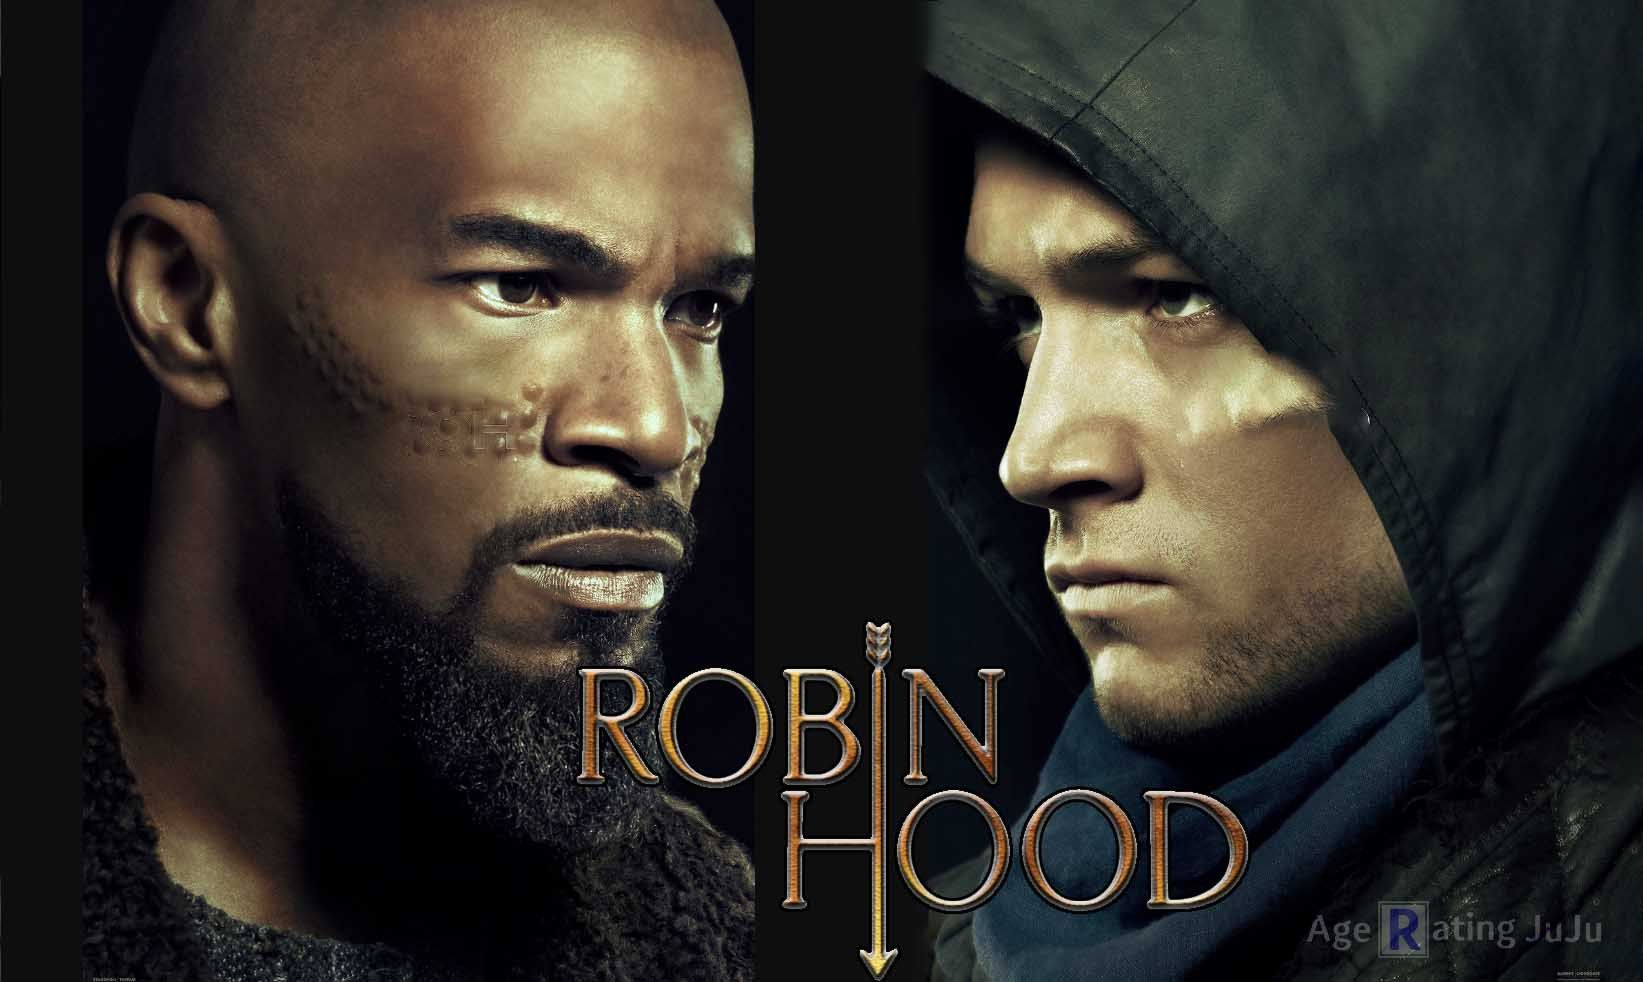 Ver Hd Robin Hood 2018 Película Completa Gratis Online En Español Latino Robin Hood English Movies Free Movies Online